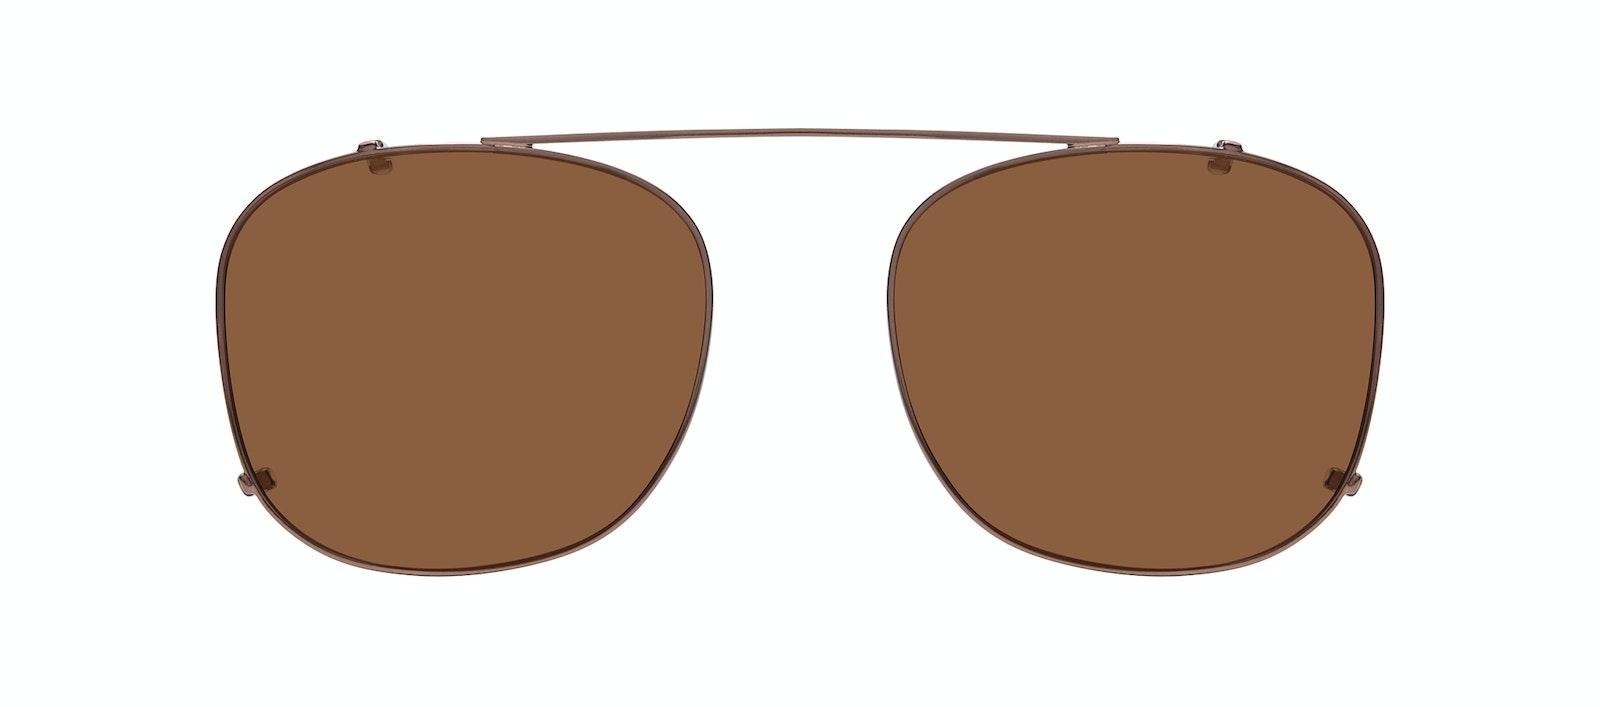 Affordable Fashion Glasses Accessory Men Apex Clip M Copper Front